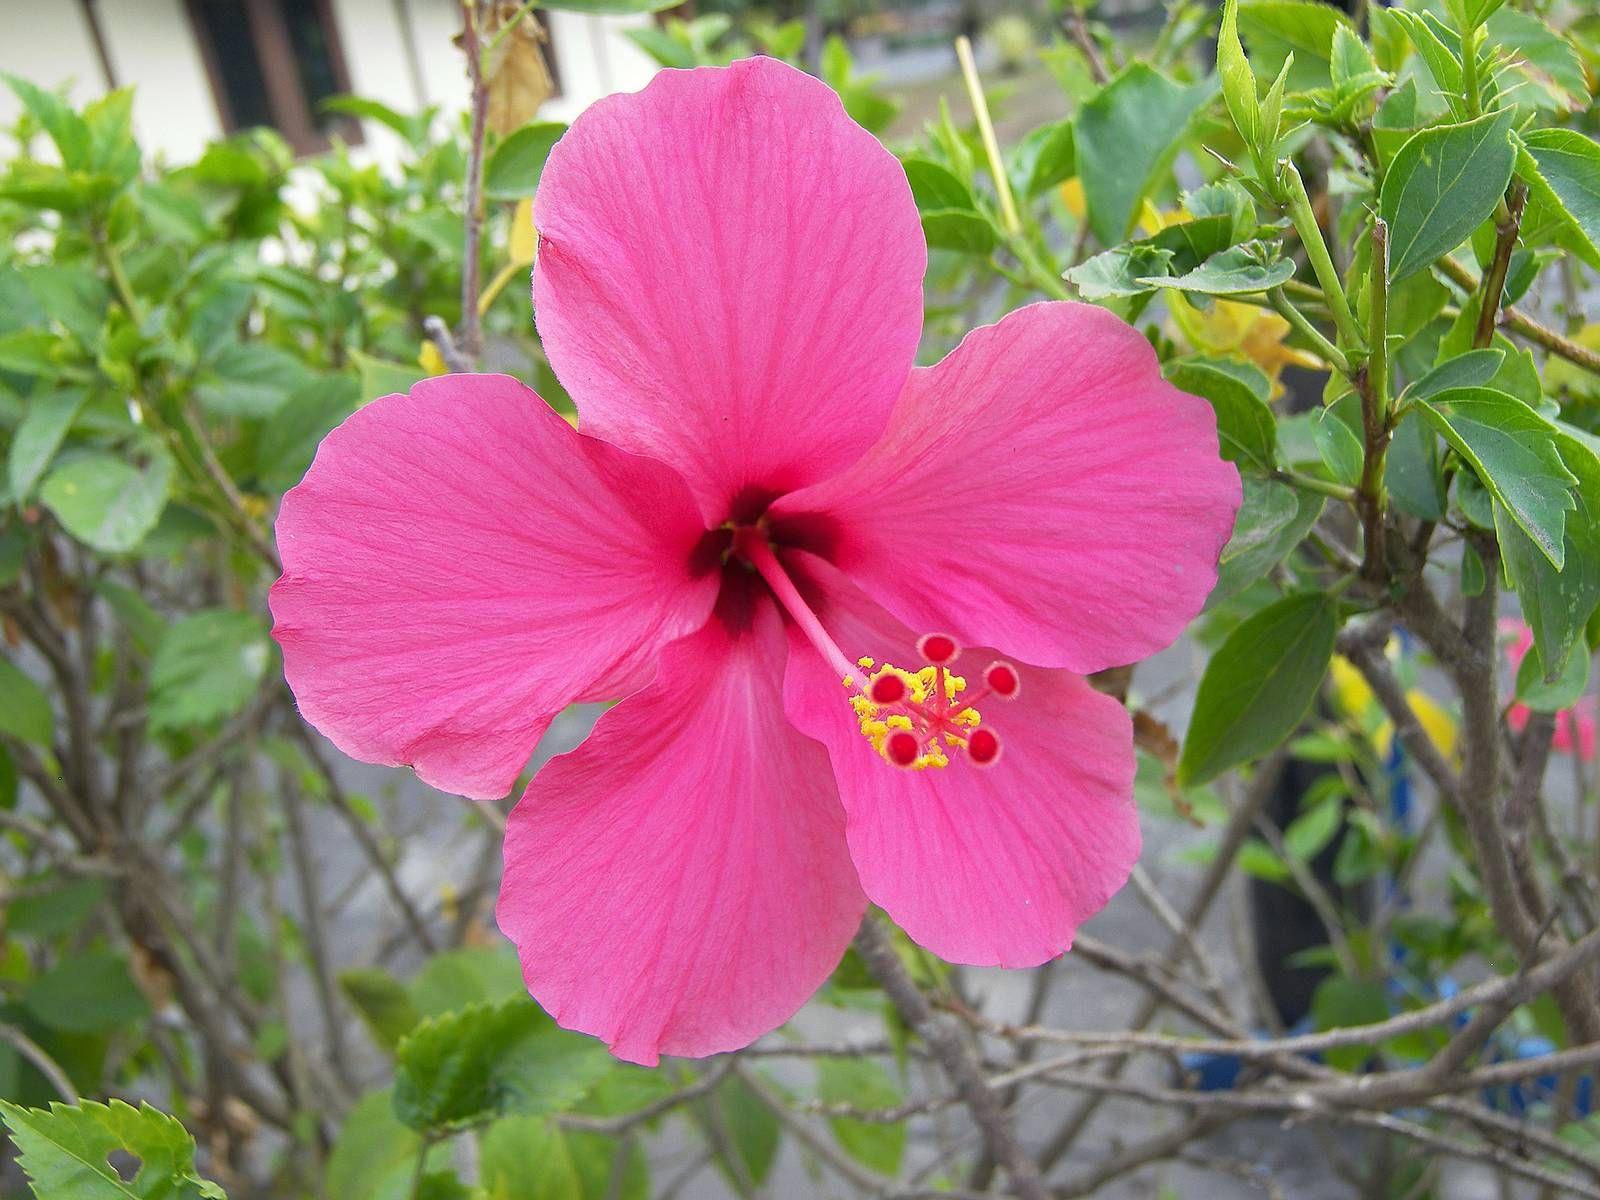 Hibiscus flower hibiscus pink hawaii flower hibiscus photo explore hawaii flowers tropical flowers and more izmirmasajfo Choice Image